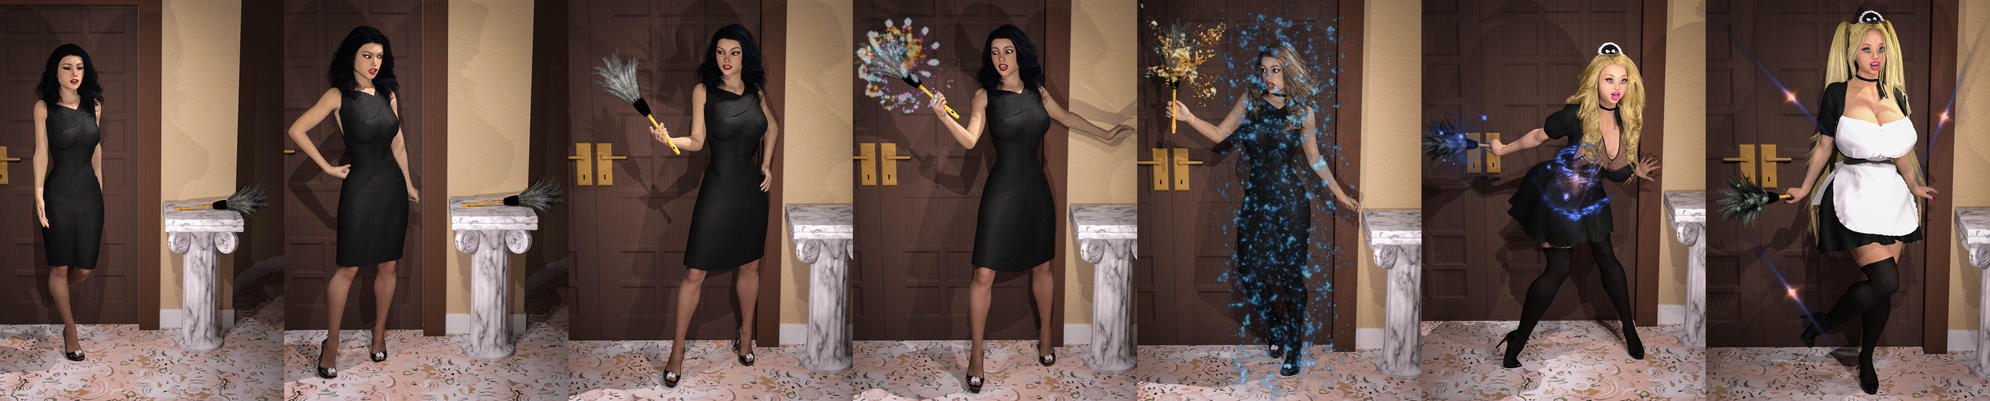 The Maid's Gift by abimboleb